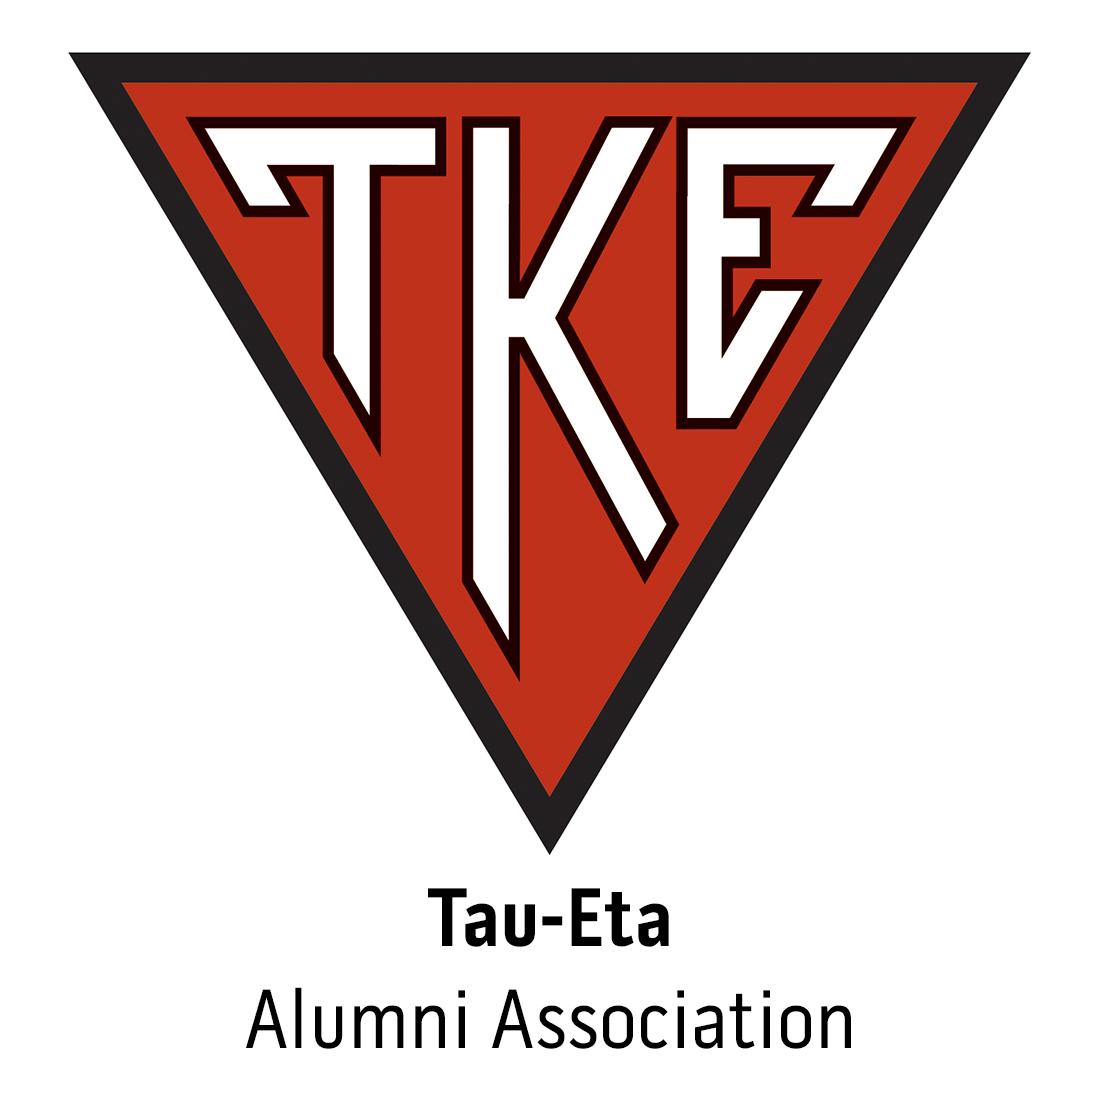 Tau-Eta Alumni Association for Southern Connecticut State University